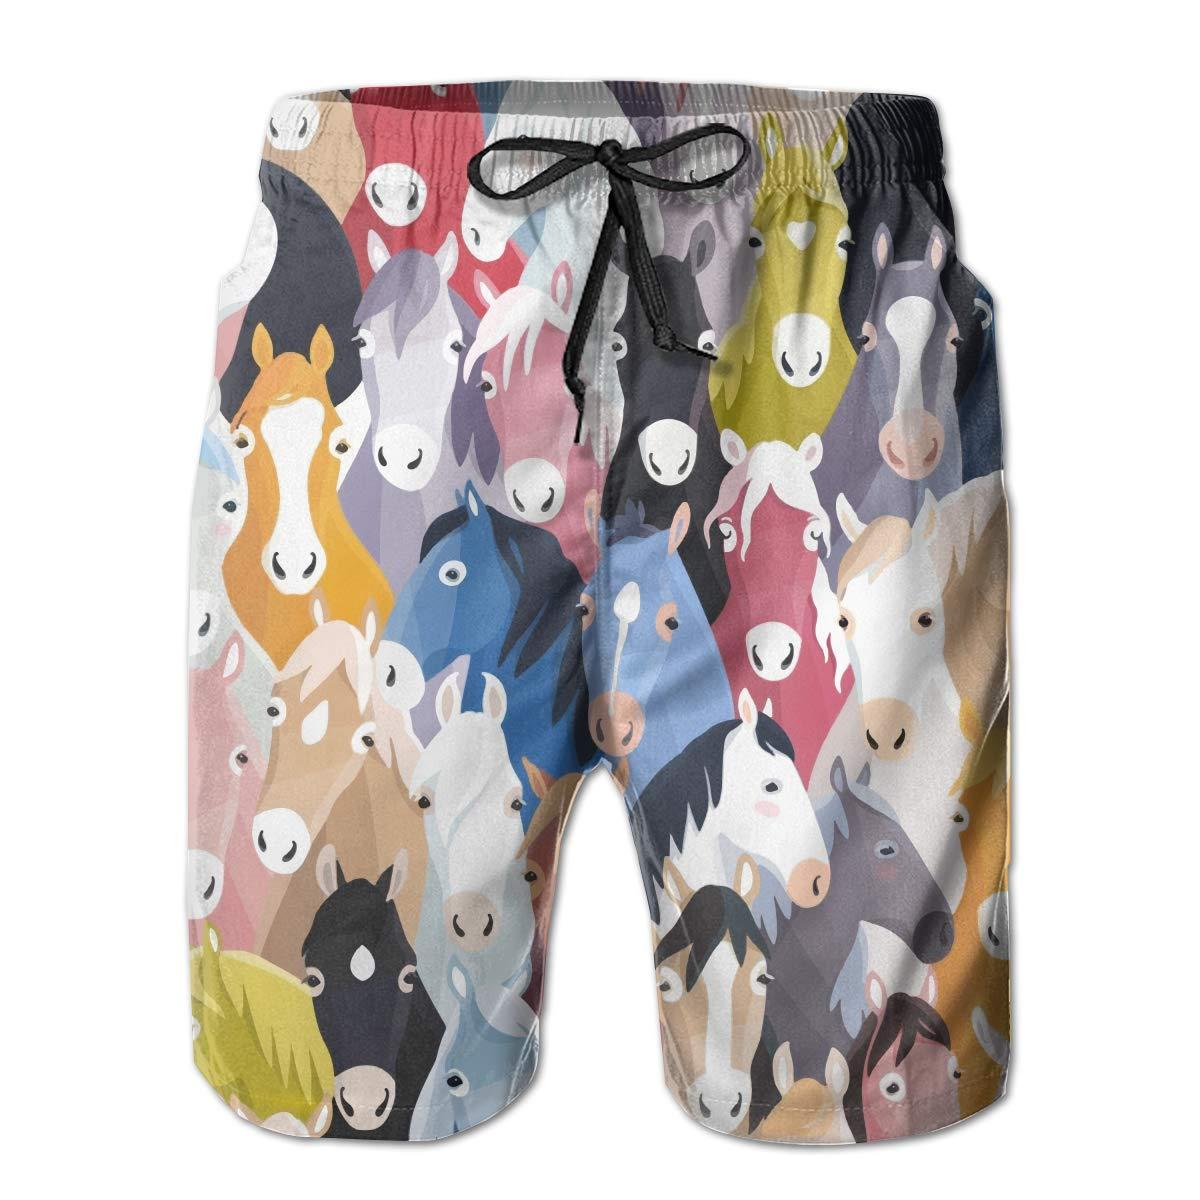 MIPU SHANGMAO Mens Horse Summer Beach Shorts Leisure Quick Dry Swimming Pants